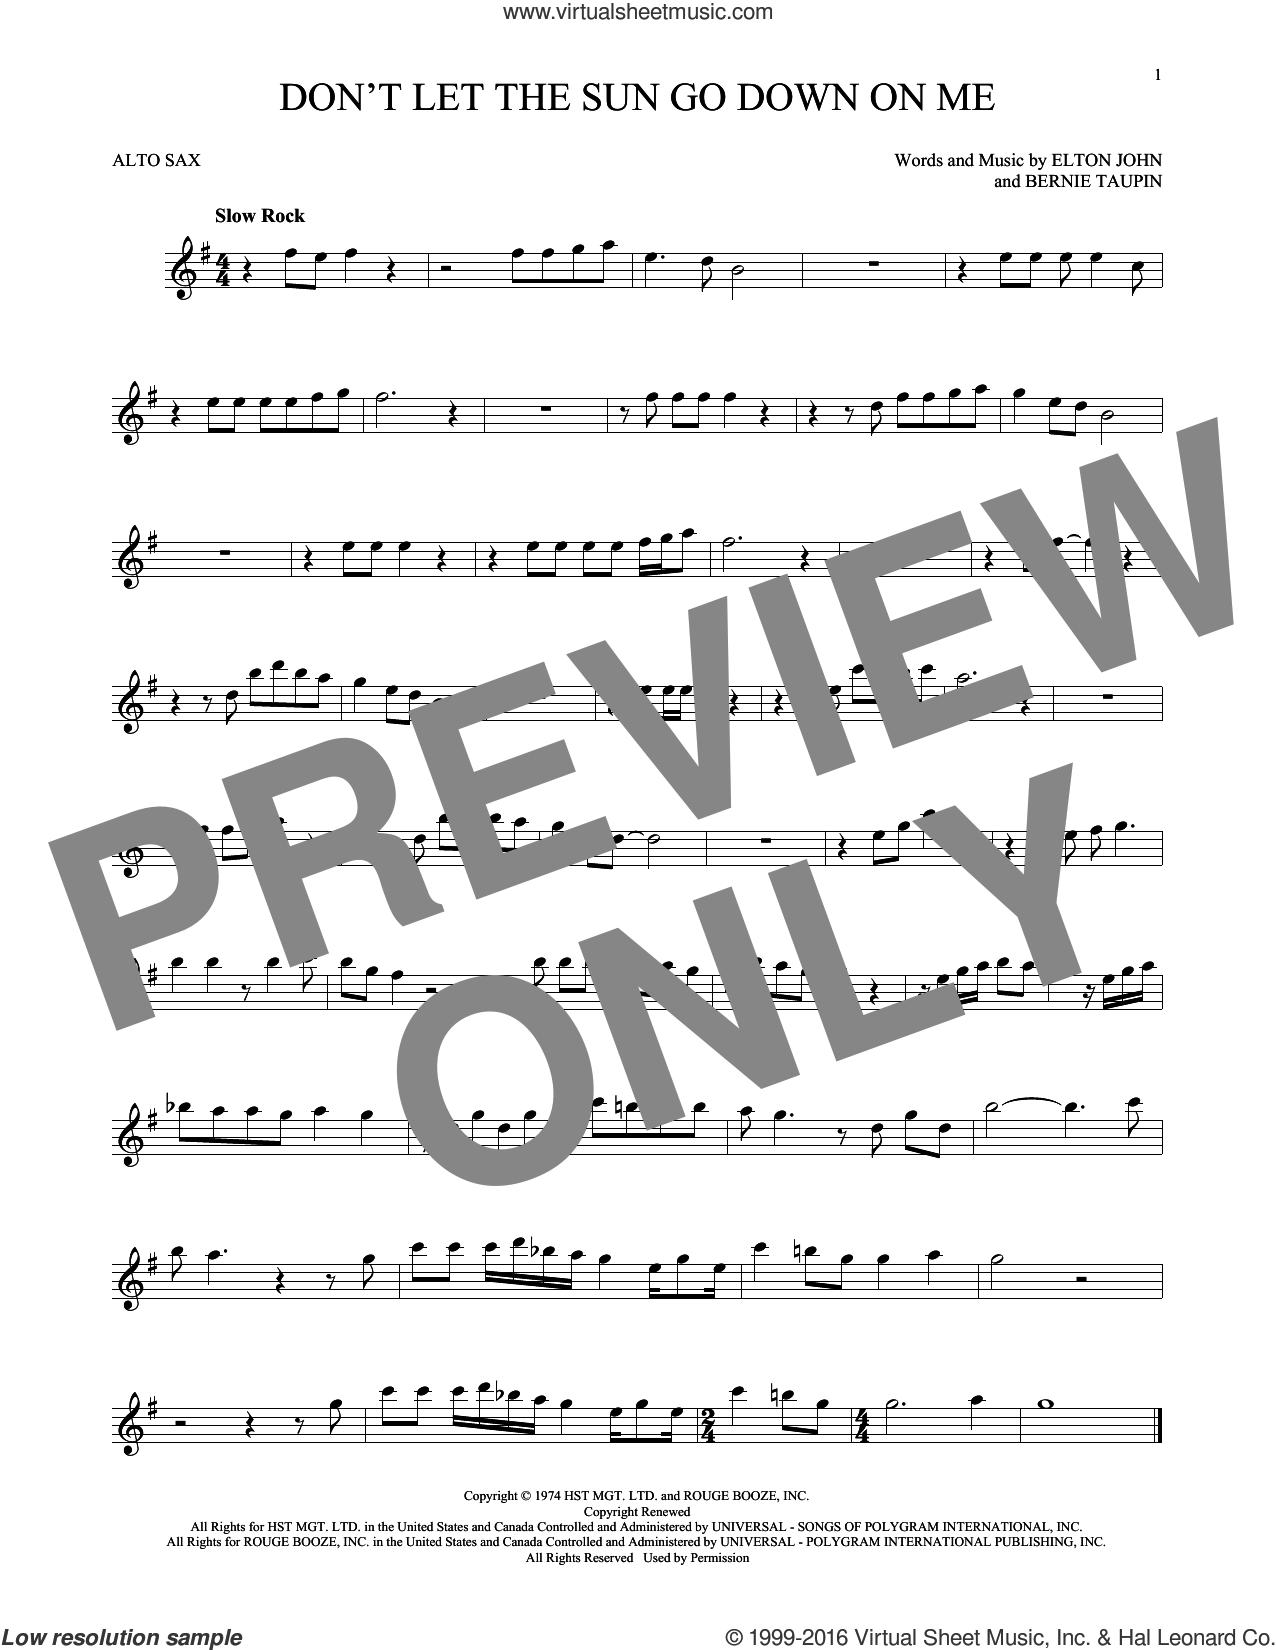 Don't Let The Sun Go Down On Me sheet music for alto saxophone solo by Elton John & George Michael, Bernie Taupin and Elton John, intermediate skill level